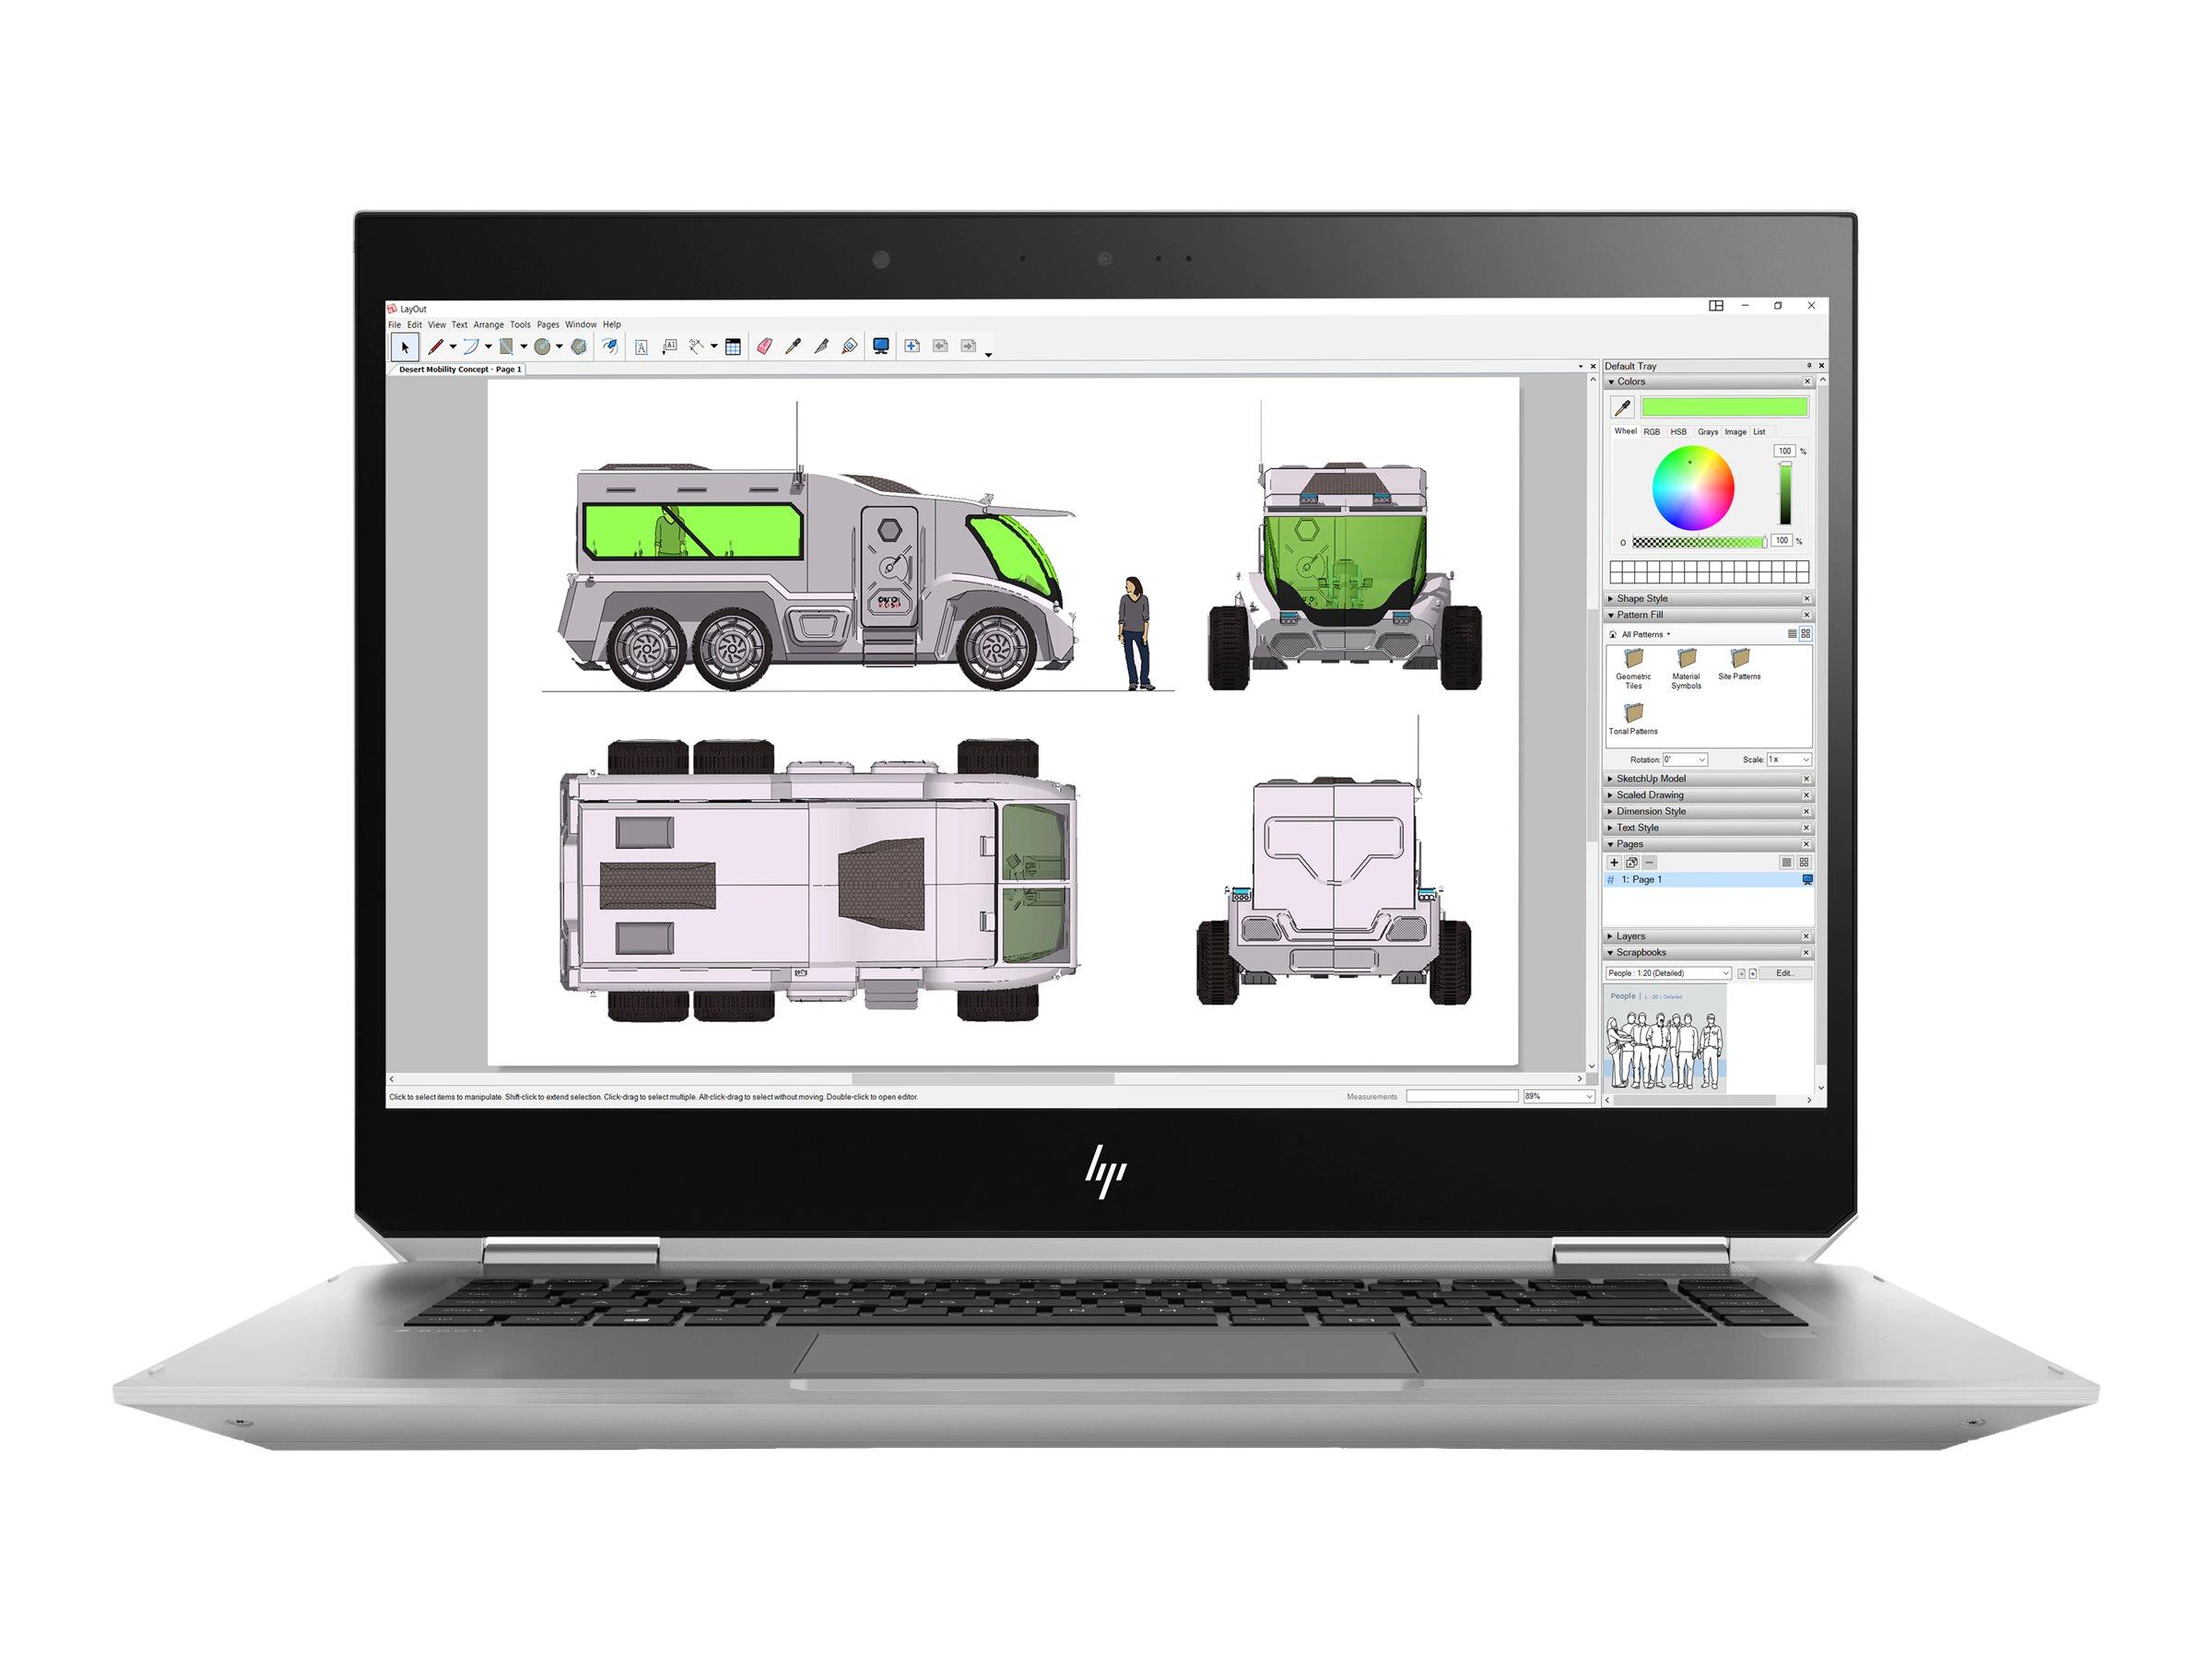 Hp zbook studio x360 g5 mobile workstation flip design core i5 8400h 2 5 ghz win 10 pro 64 bit 8 gb ram 256 gb ssd 16 gb ssd cache tlc 9038473 4qh12ea abd